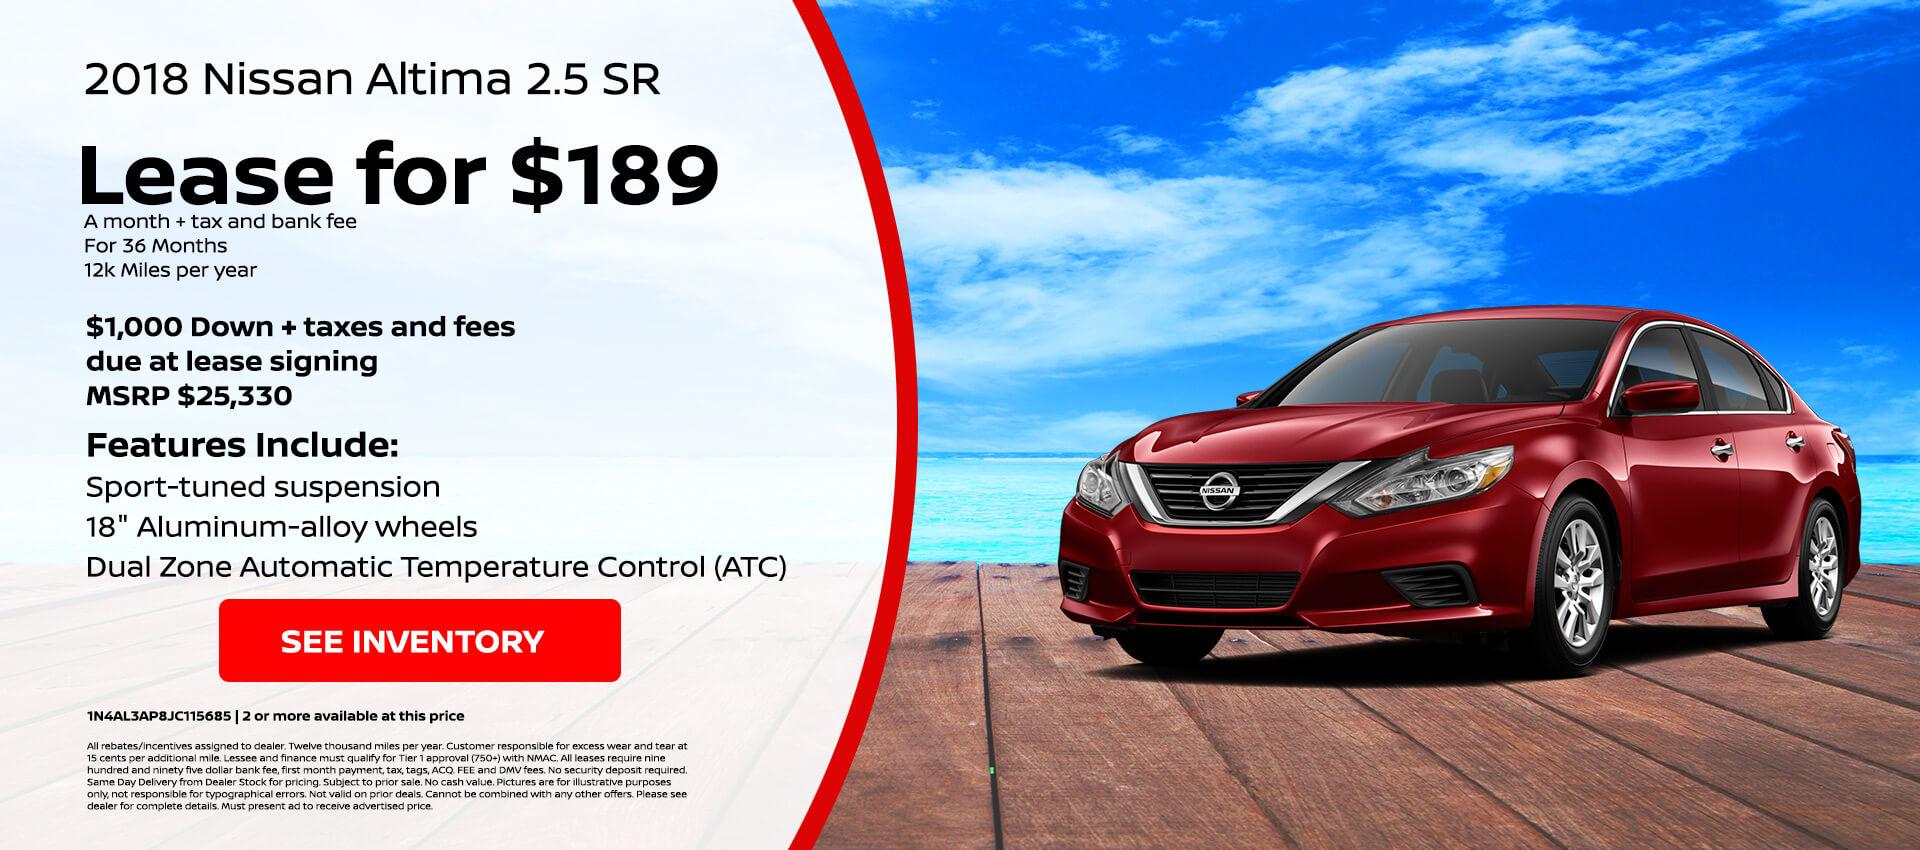 Nissan Altima $189 Lease